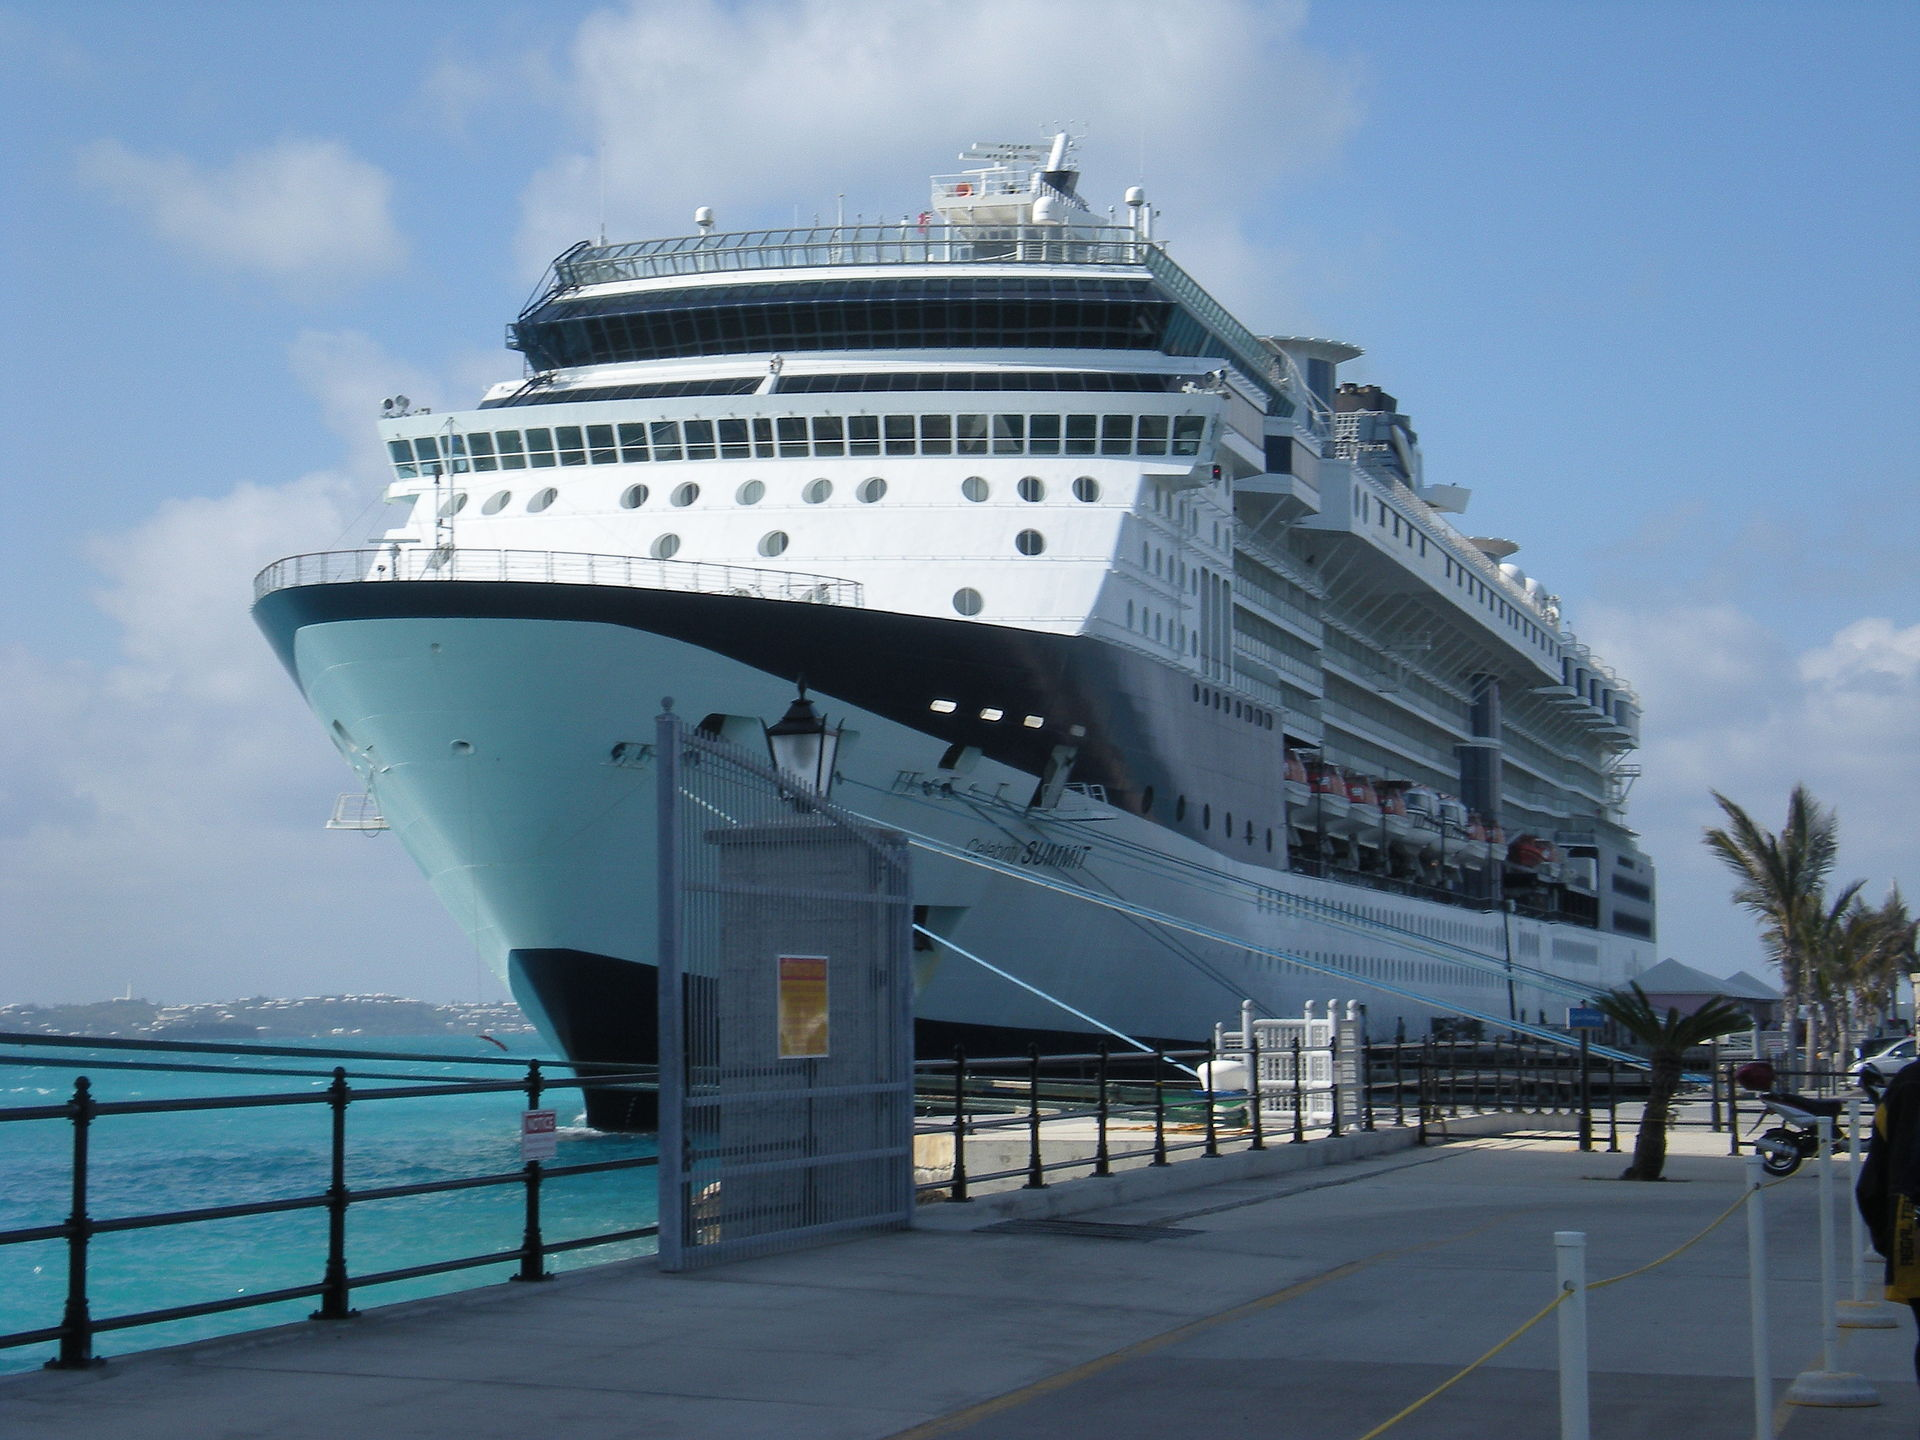 Celebrity Eclipse Cruise Ship: Review, Photos & Departure ...